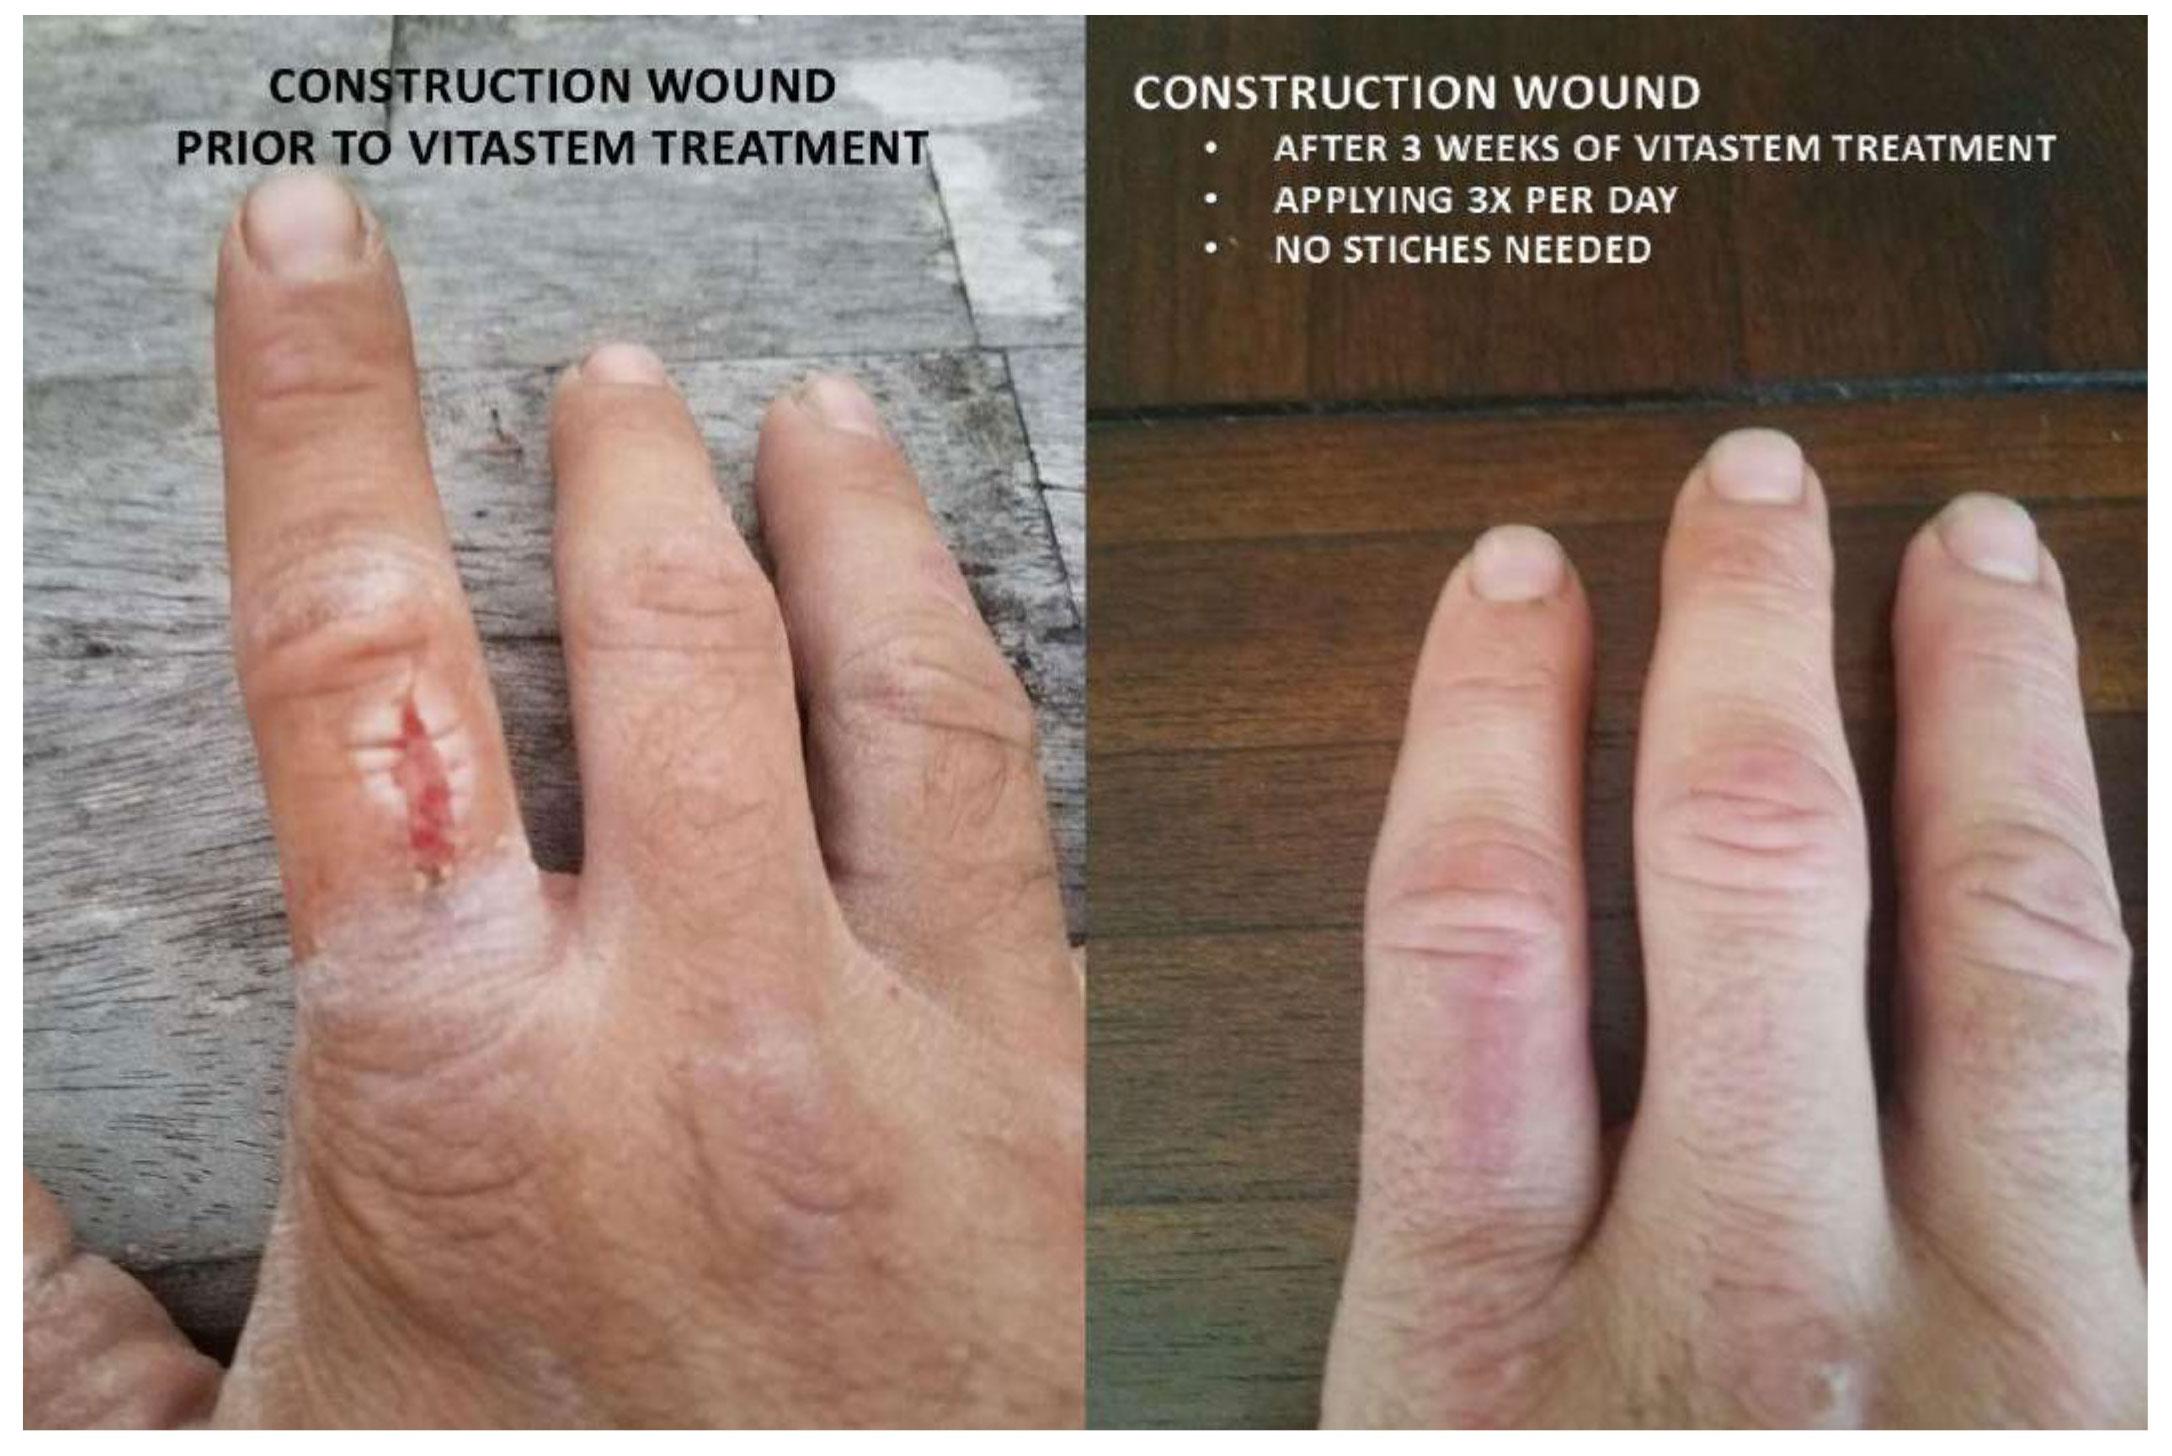 Construction Wound Case Study